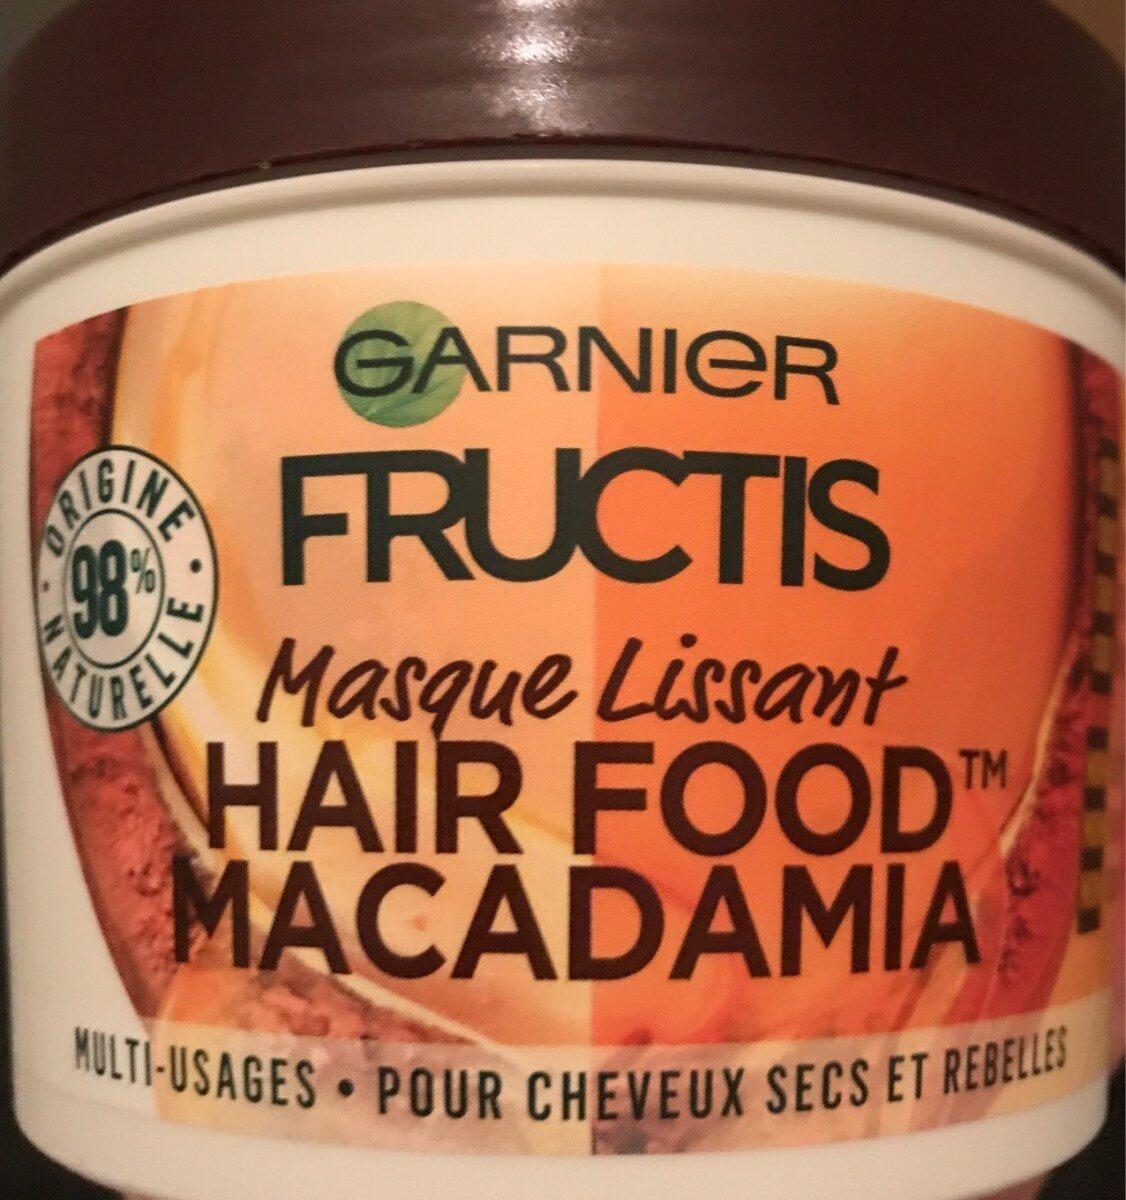 Masque lissant hair food macadamia - Product